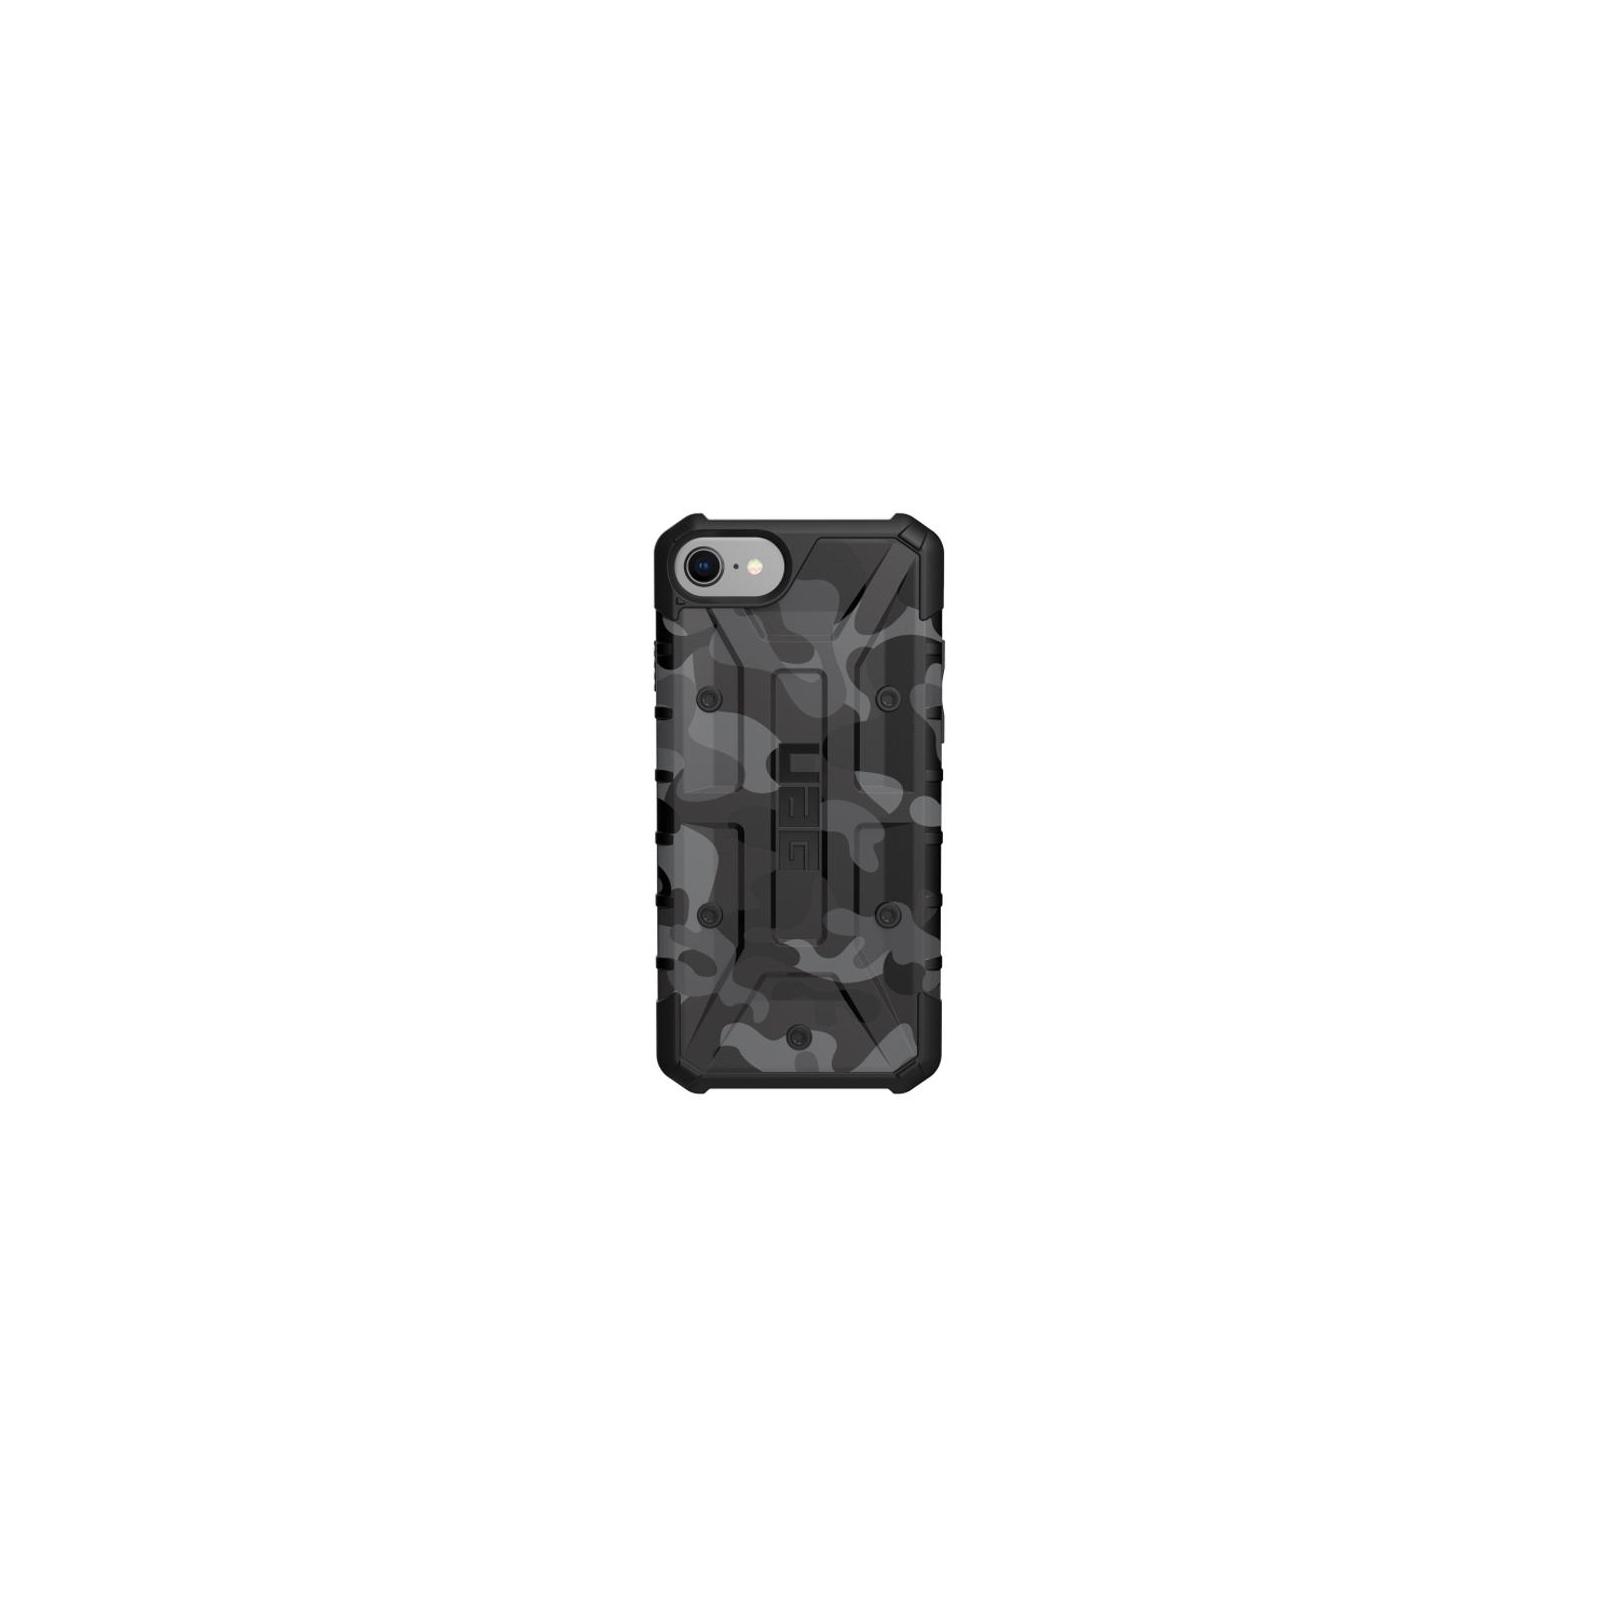 Чехол для моб. телефона UAG iPhone 8/7/6S/6 Pathfinder Camo Gray/Black (IPH8/7-A-BC)